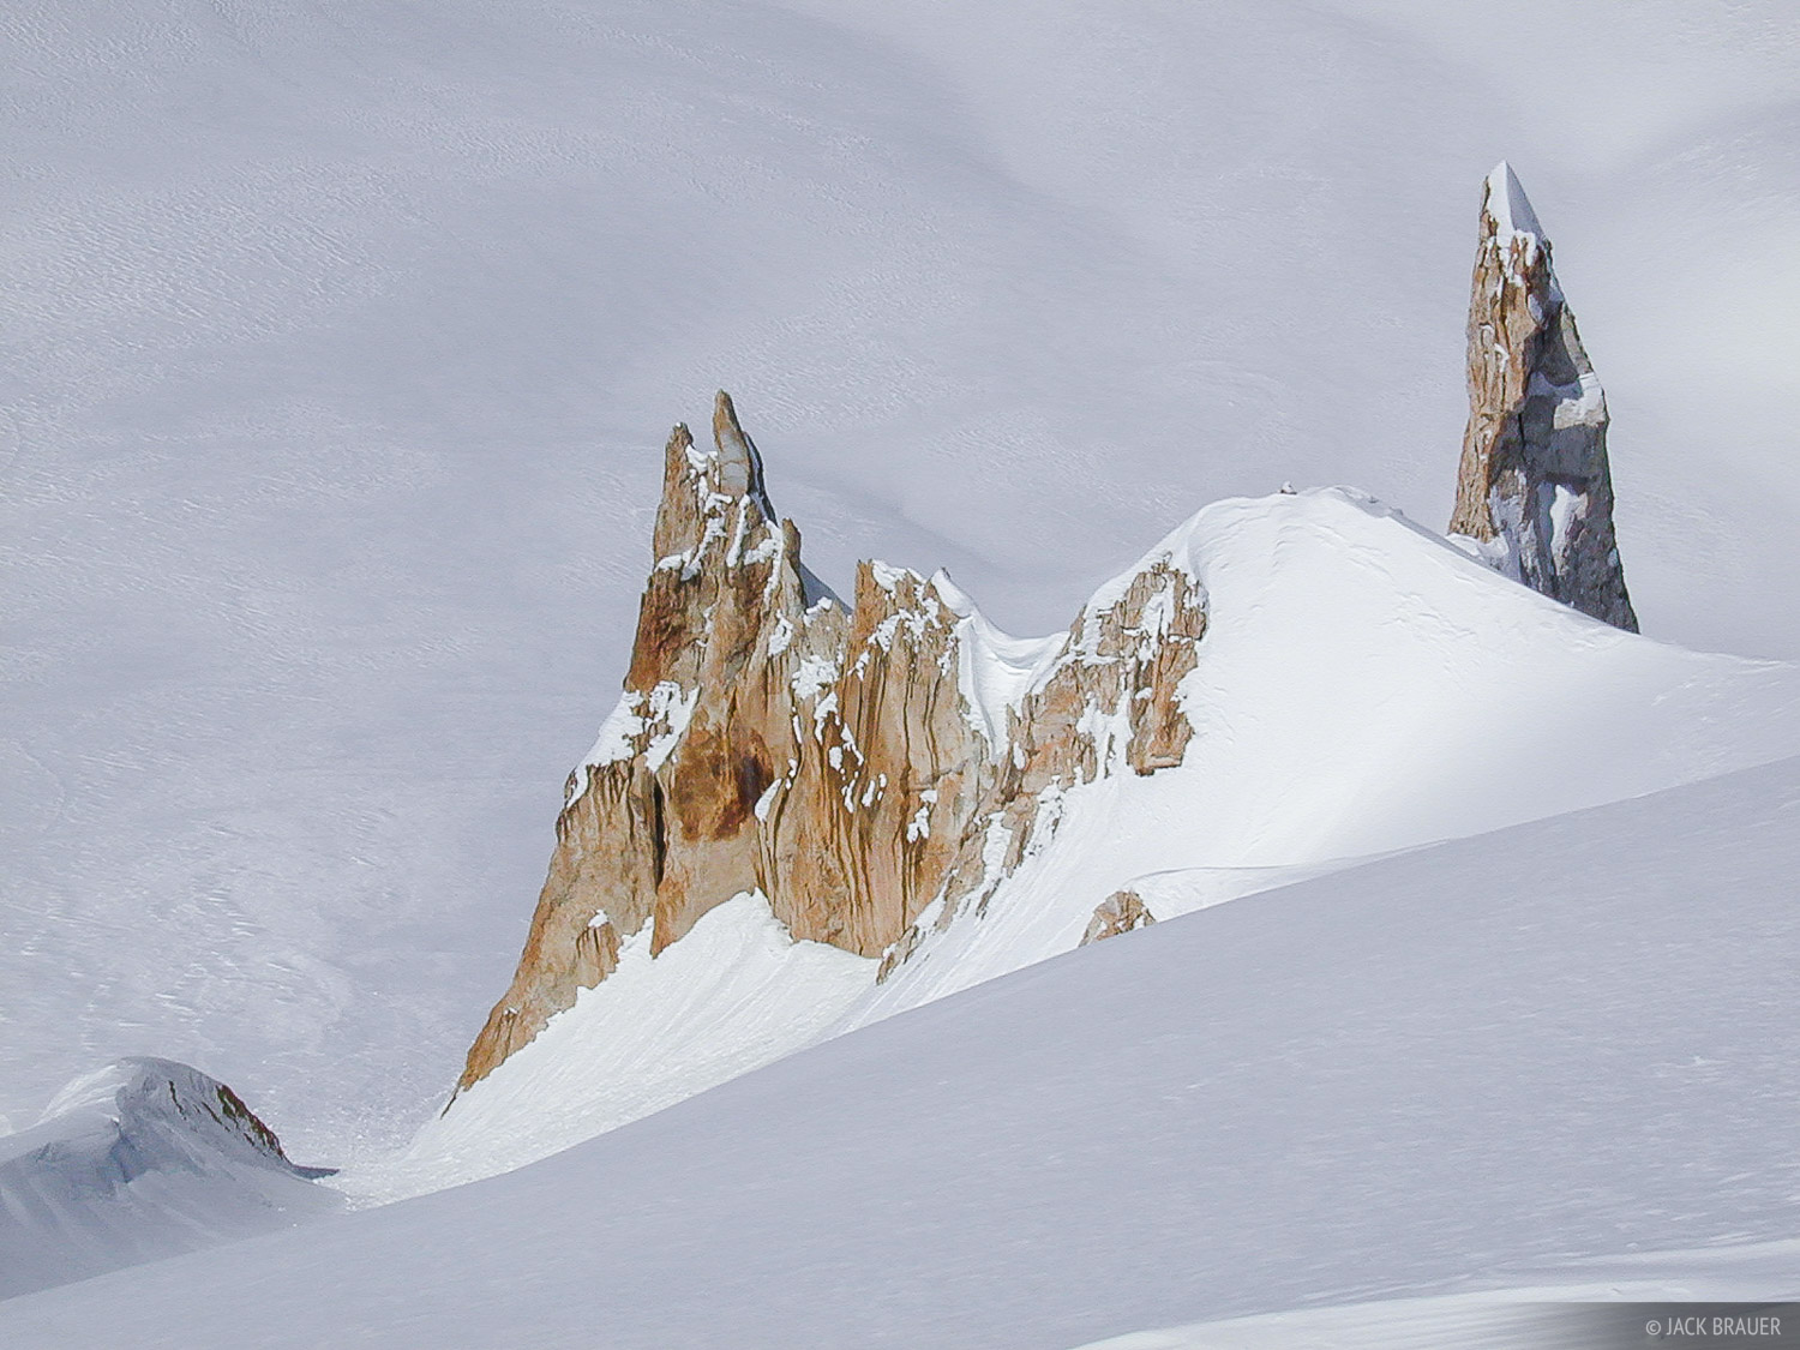 Cerro Torresillas, chute, Argentina, snowboarding, Las Leñas, photo